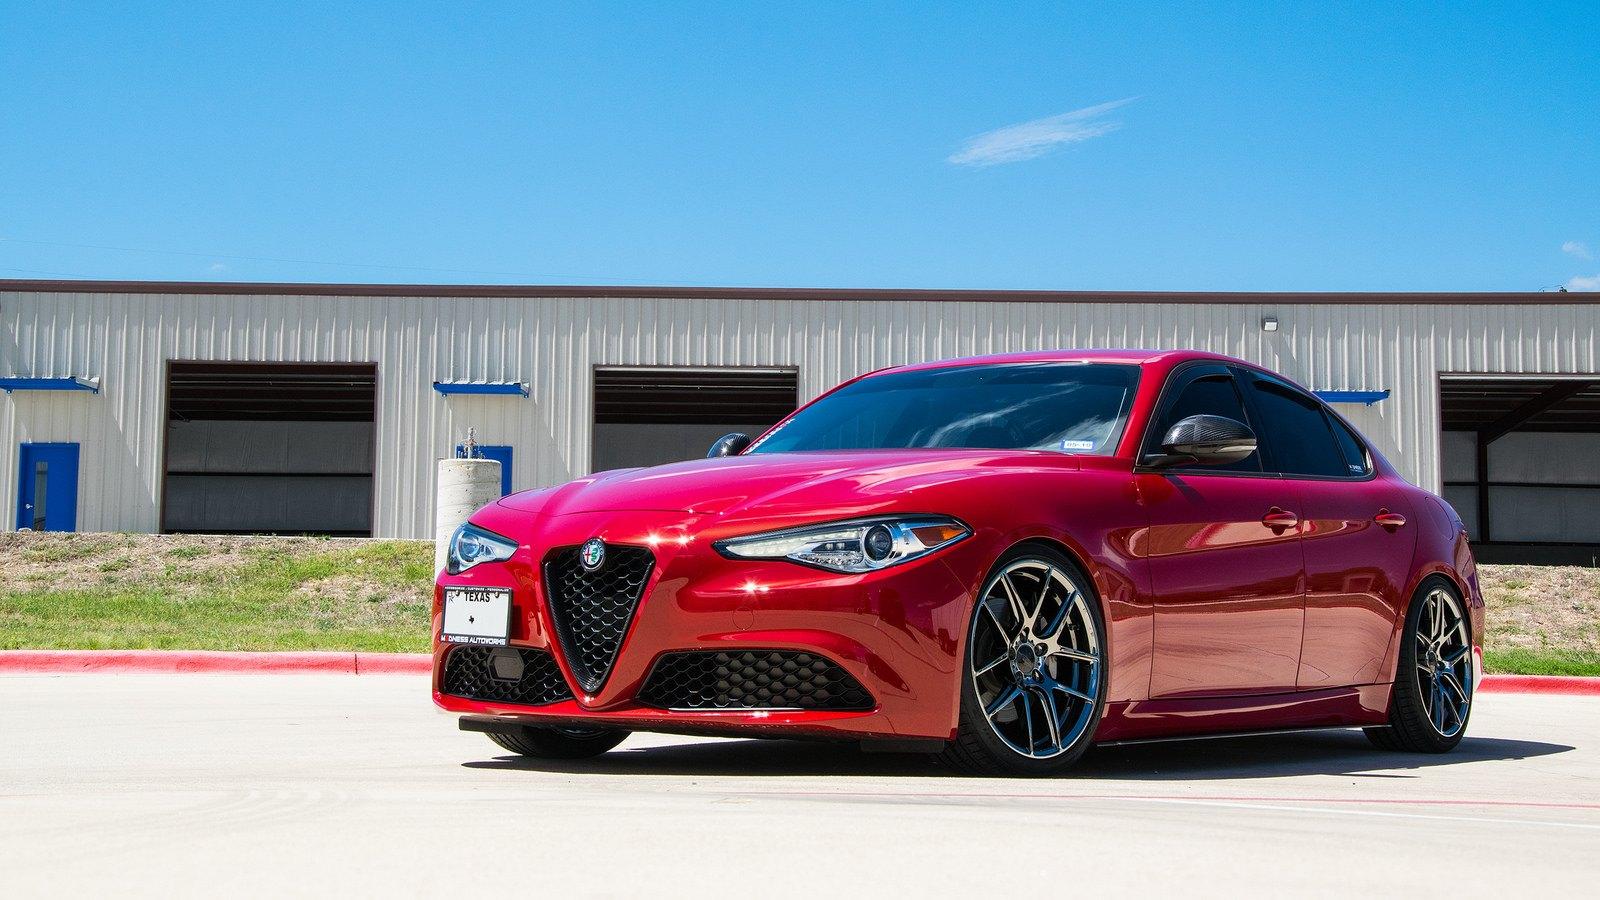 Custom 2019 Alfa Romeo Giulia   Images, Mods, Photos ...